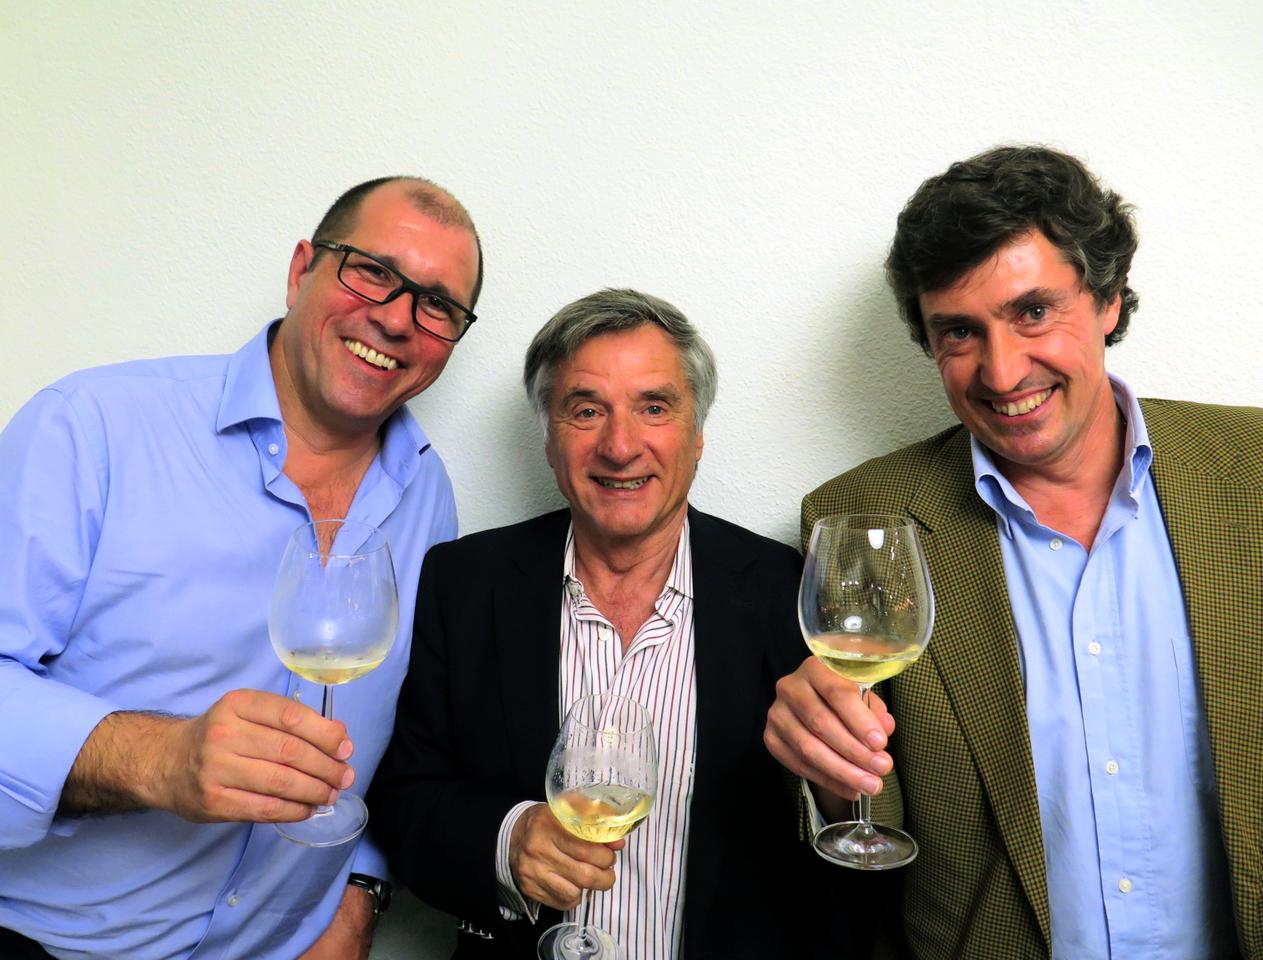 Paulo Santos, Manuel Vieira, Carlos Magalhães